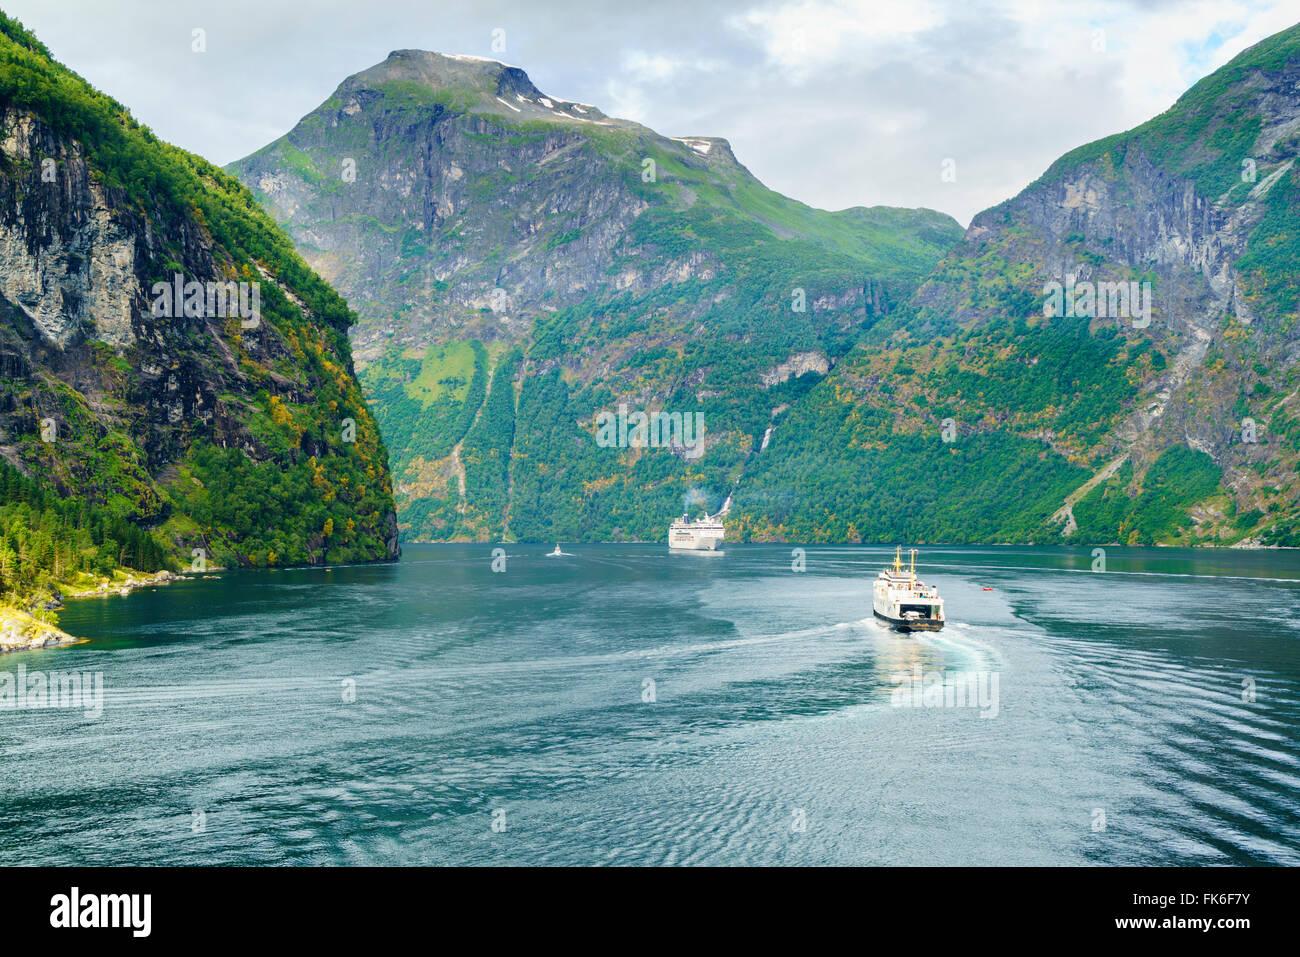 Gerainger Fjord, UNESCO World Heritage Site, Norway, Scandinavia, Europe Stock Photo